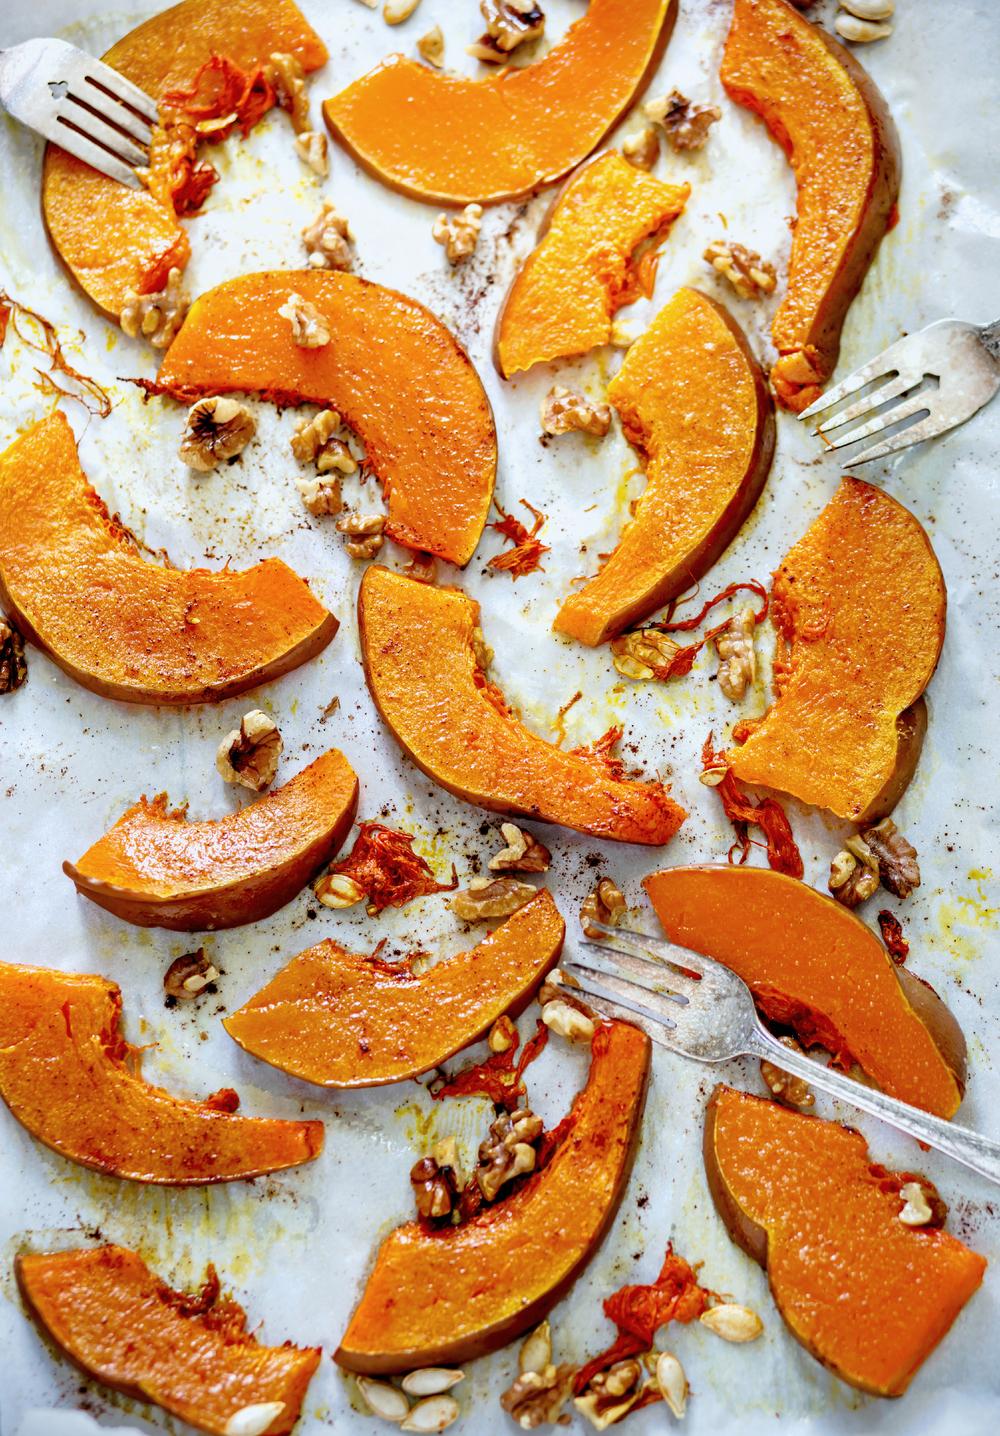 roasted pumpkin with walnuts.jpg